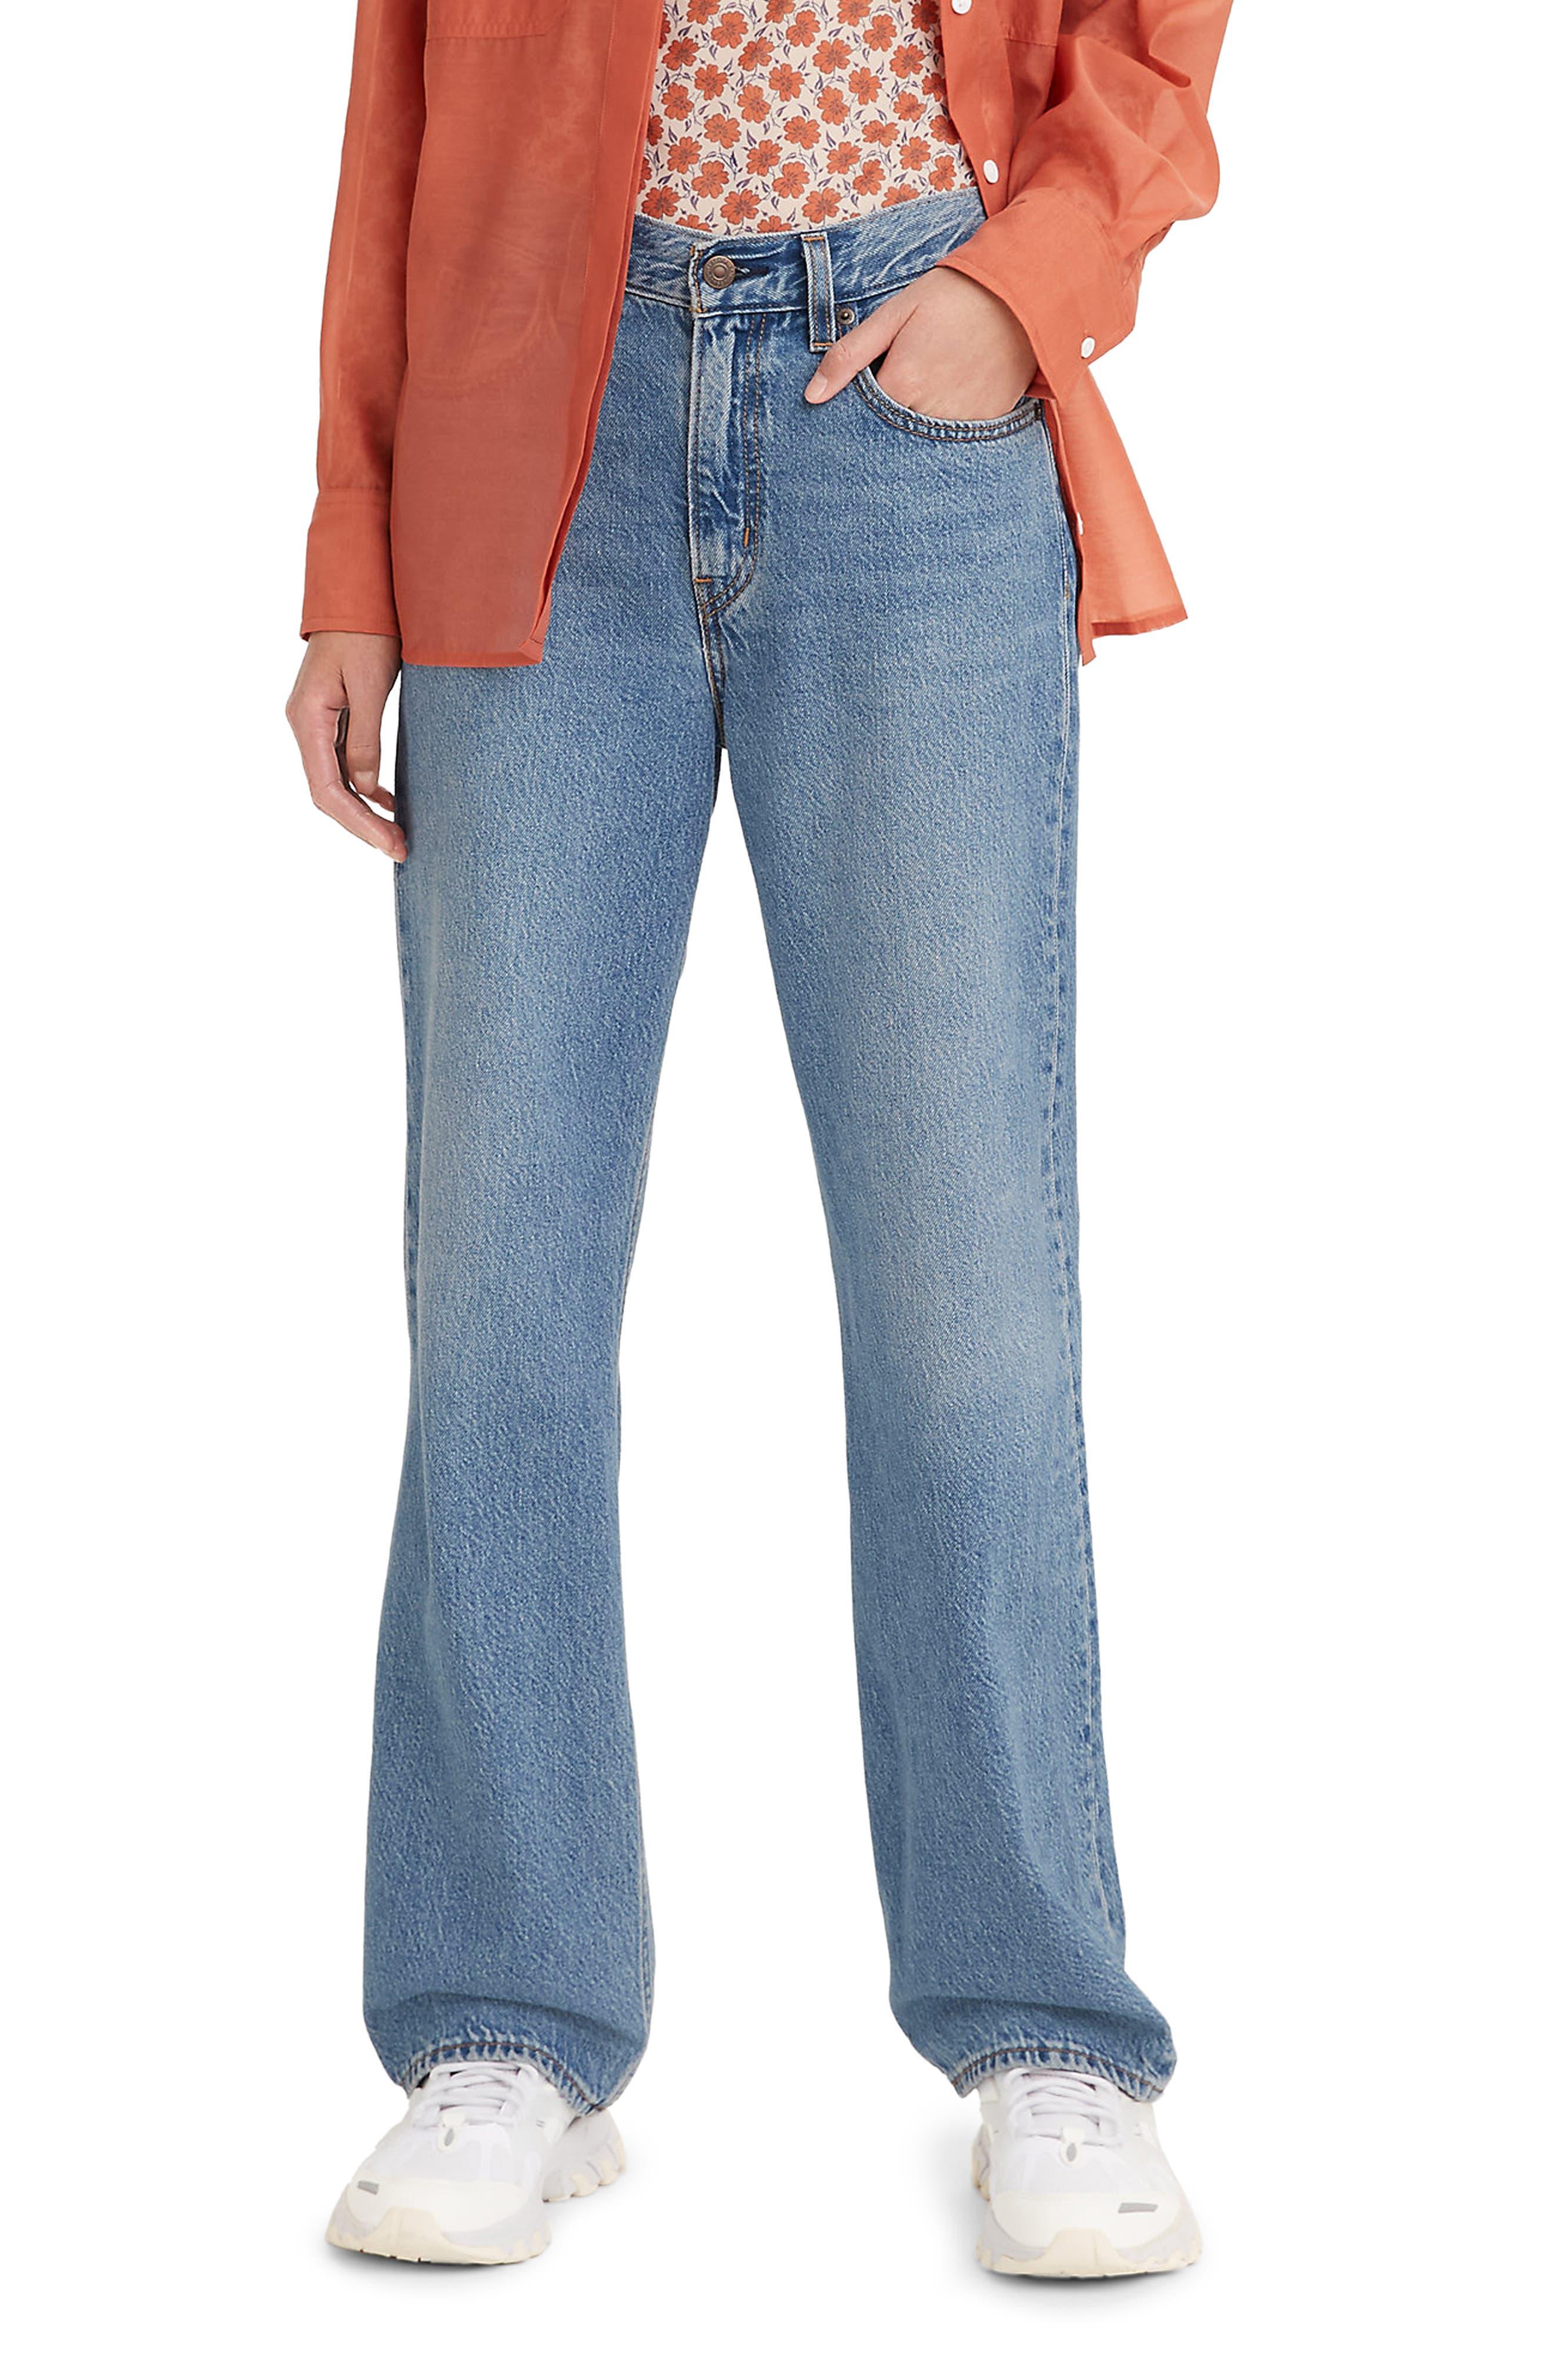 Women's Levi's Loose Straight Leg Jeans